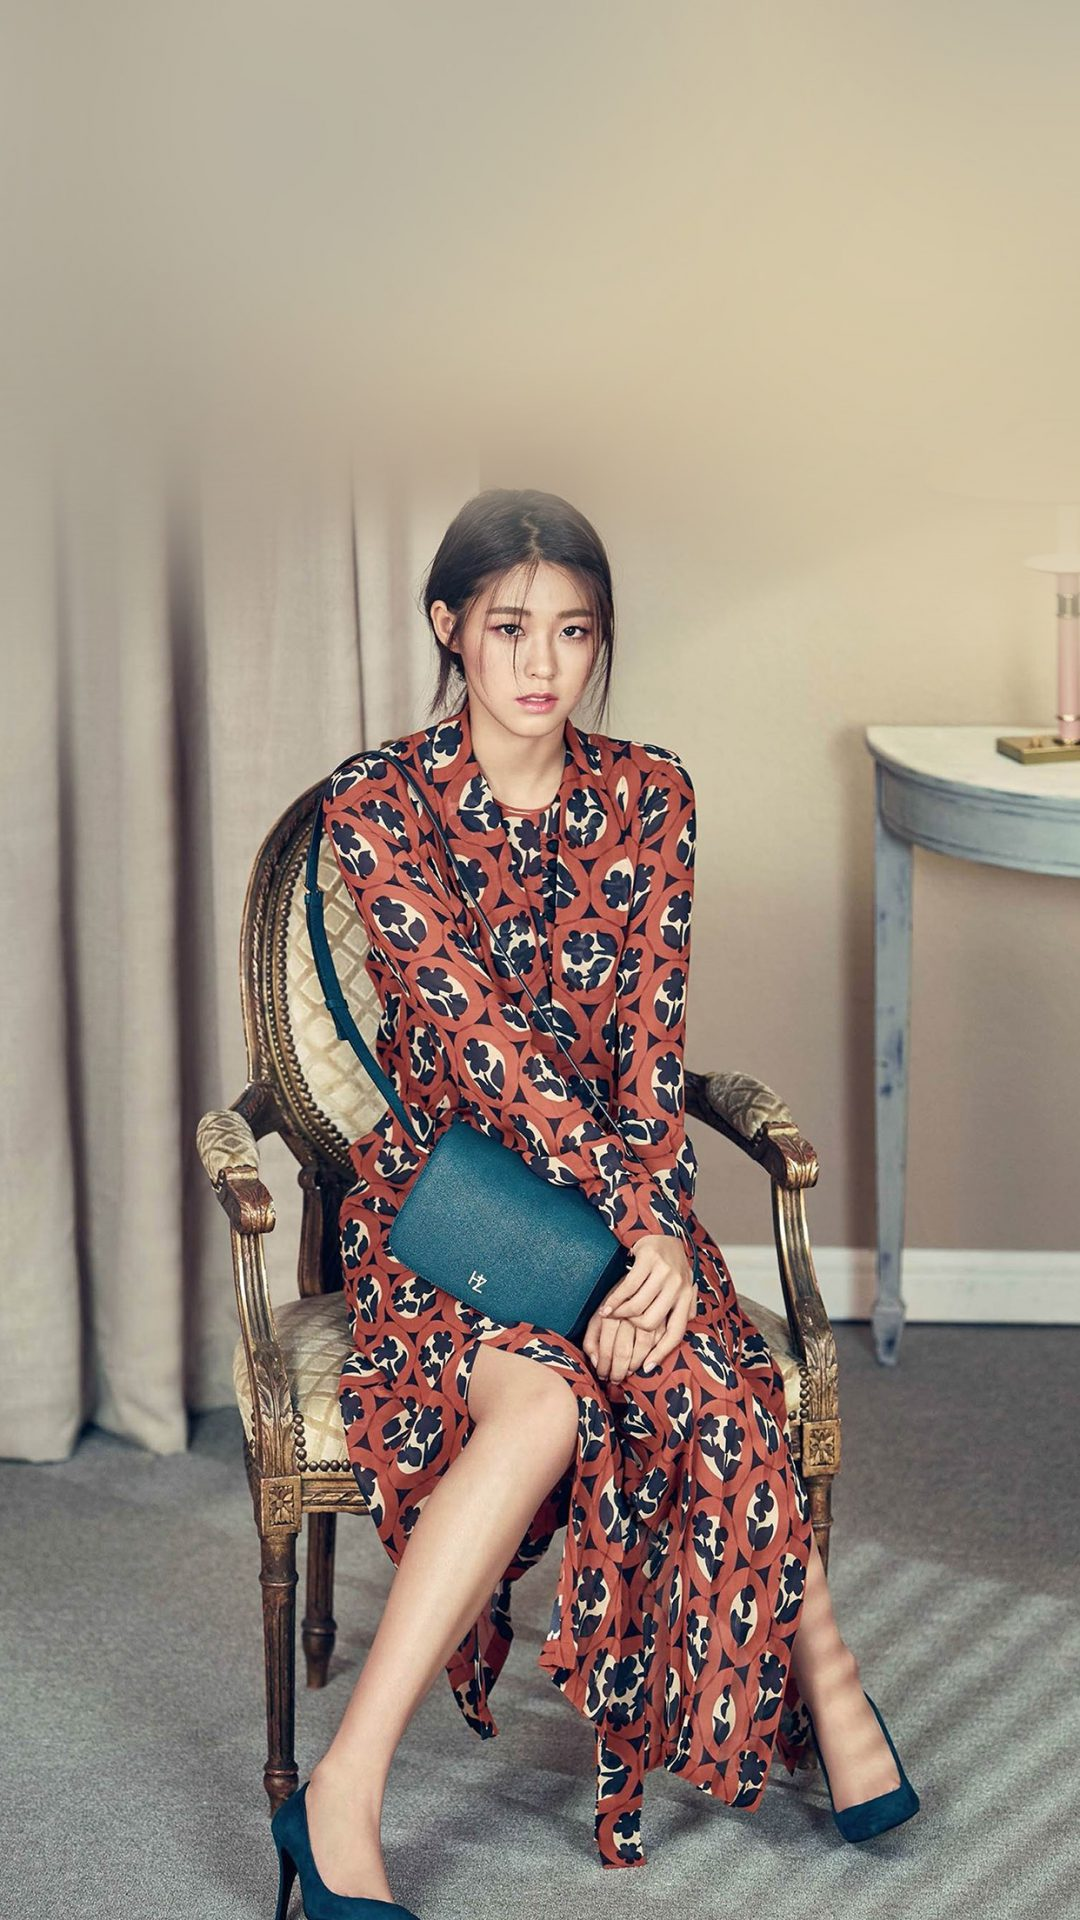 Kpop Girl Sulhyun Aoa Pose Model